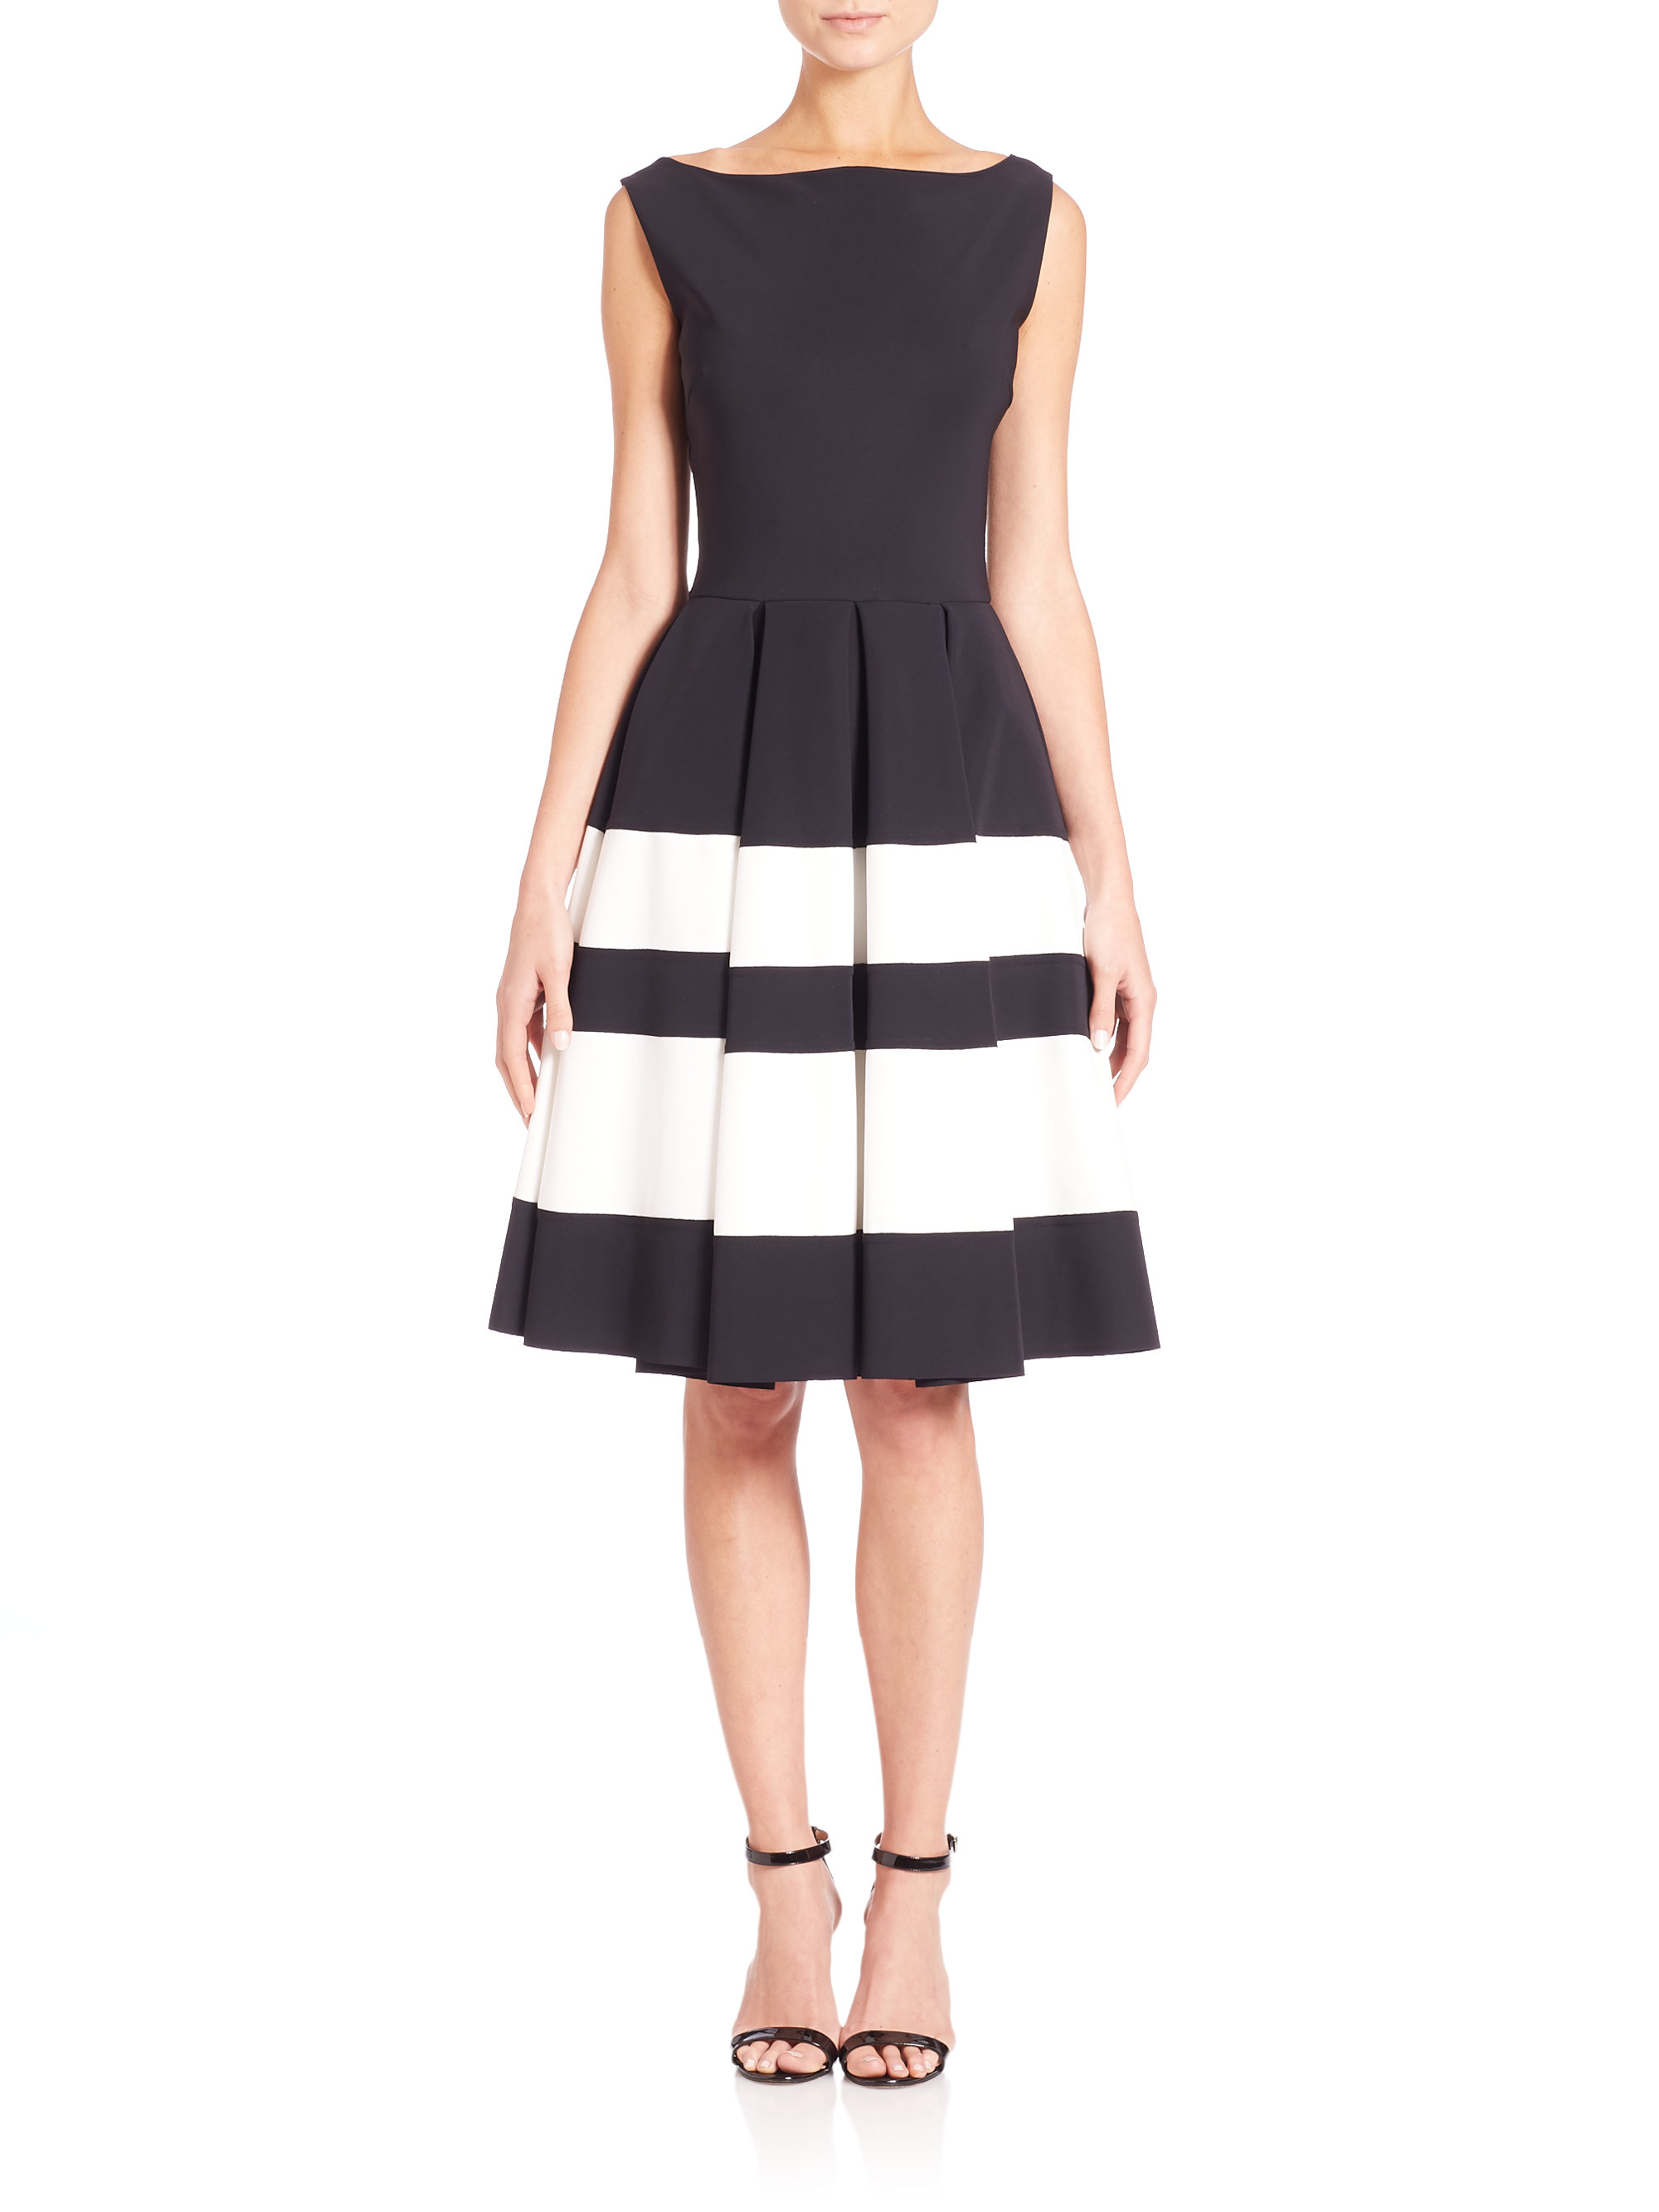 lyst la petite robe di chiara boni sleeveless boatneck fit flare dress in black. Black Bedroom Furniture Sets. Home Design Ideas